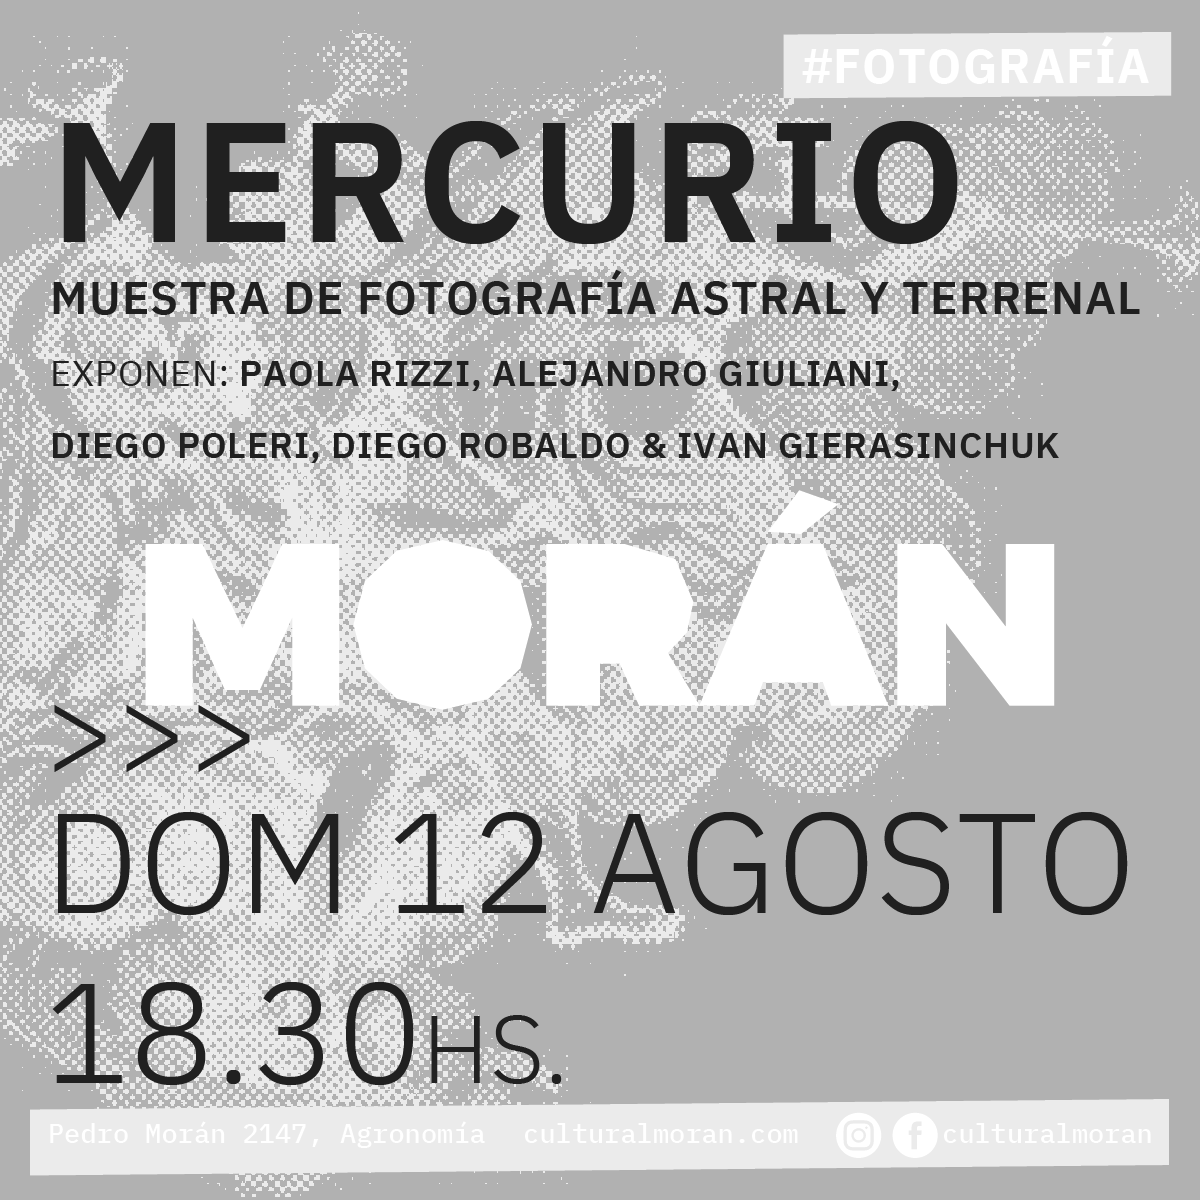 180812_MORA�N - Mercurio - REDES-F.png